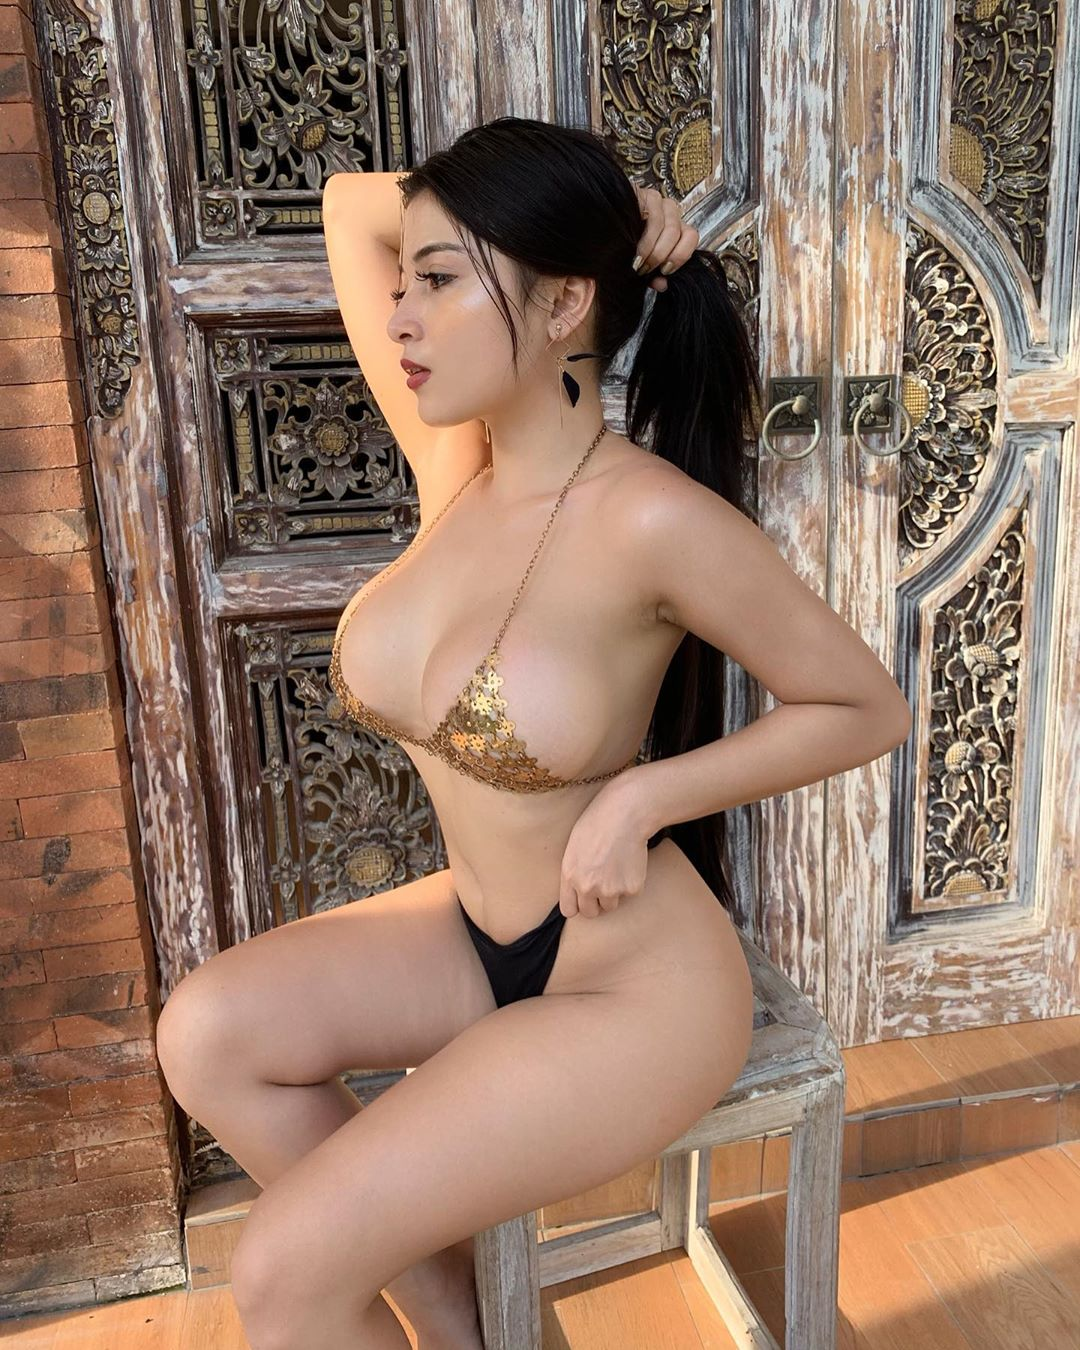 mar-anne almosa instagram bikini pics 02